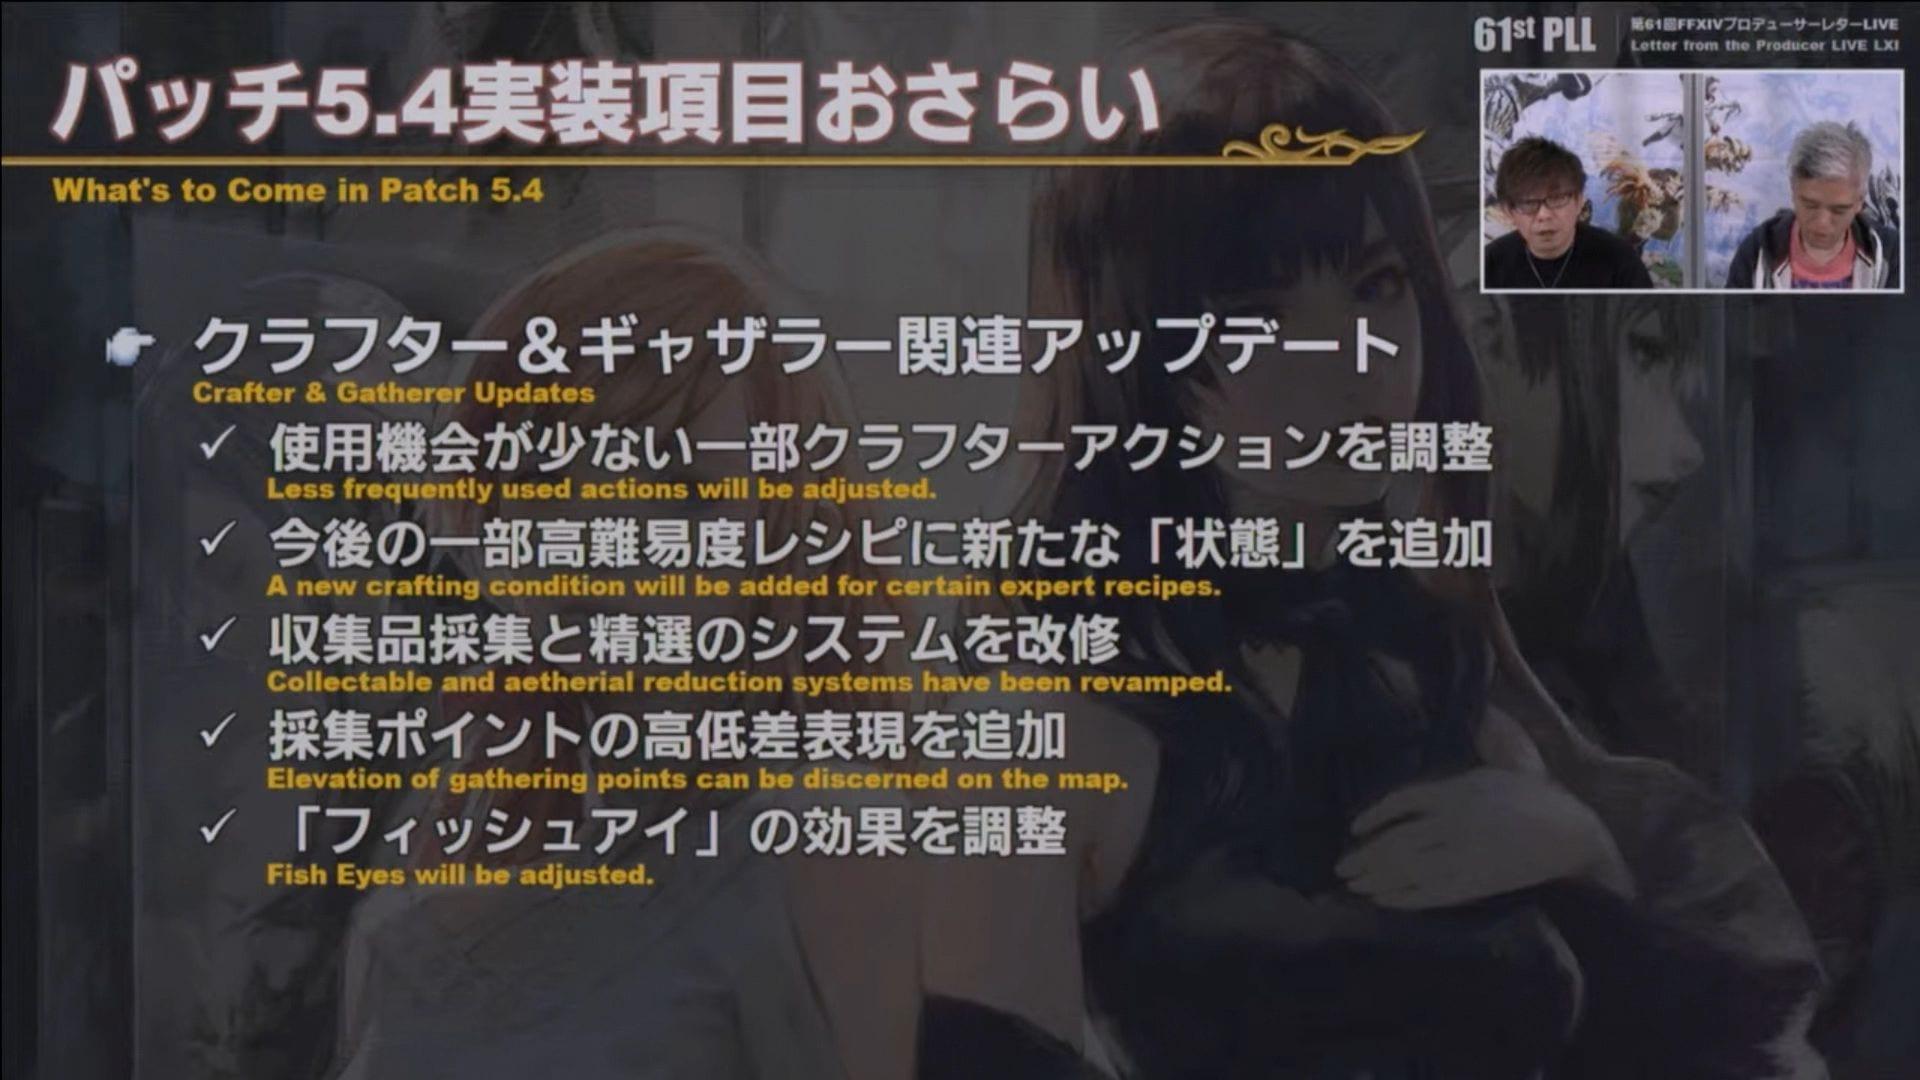 Final-Fantasy-XIV-Screenshot-2020-11-27-13-24-28.jpg